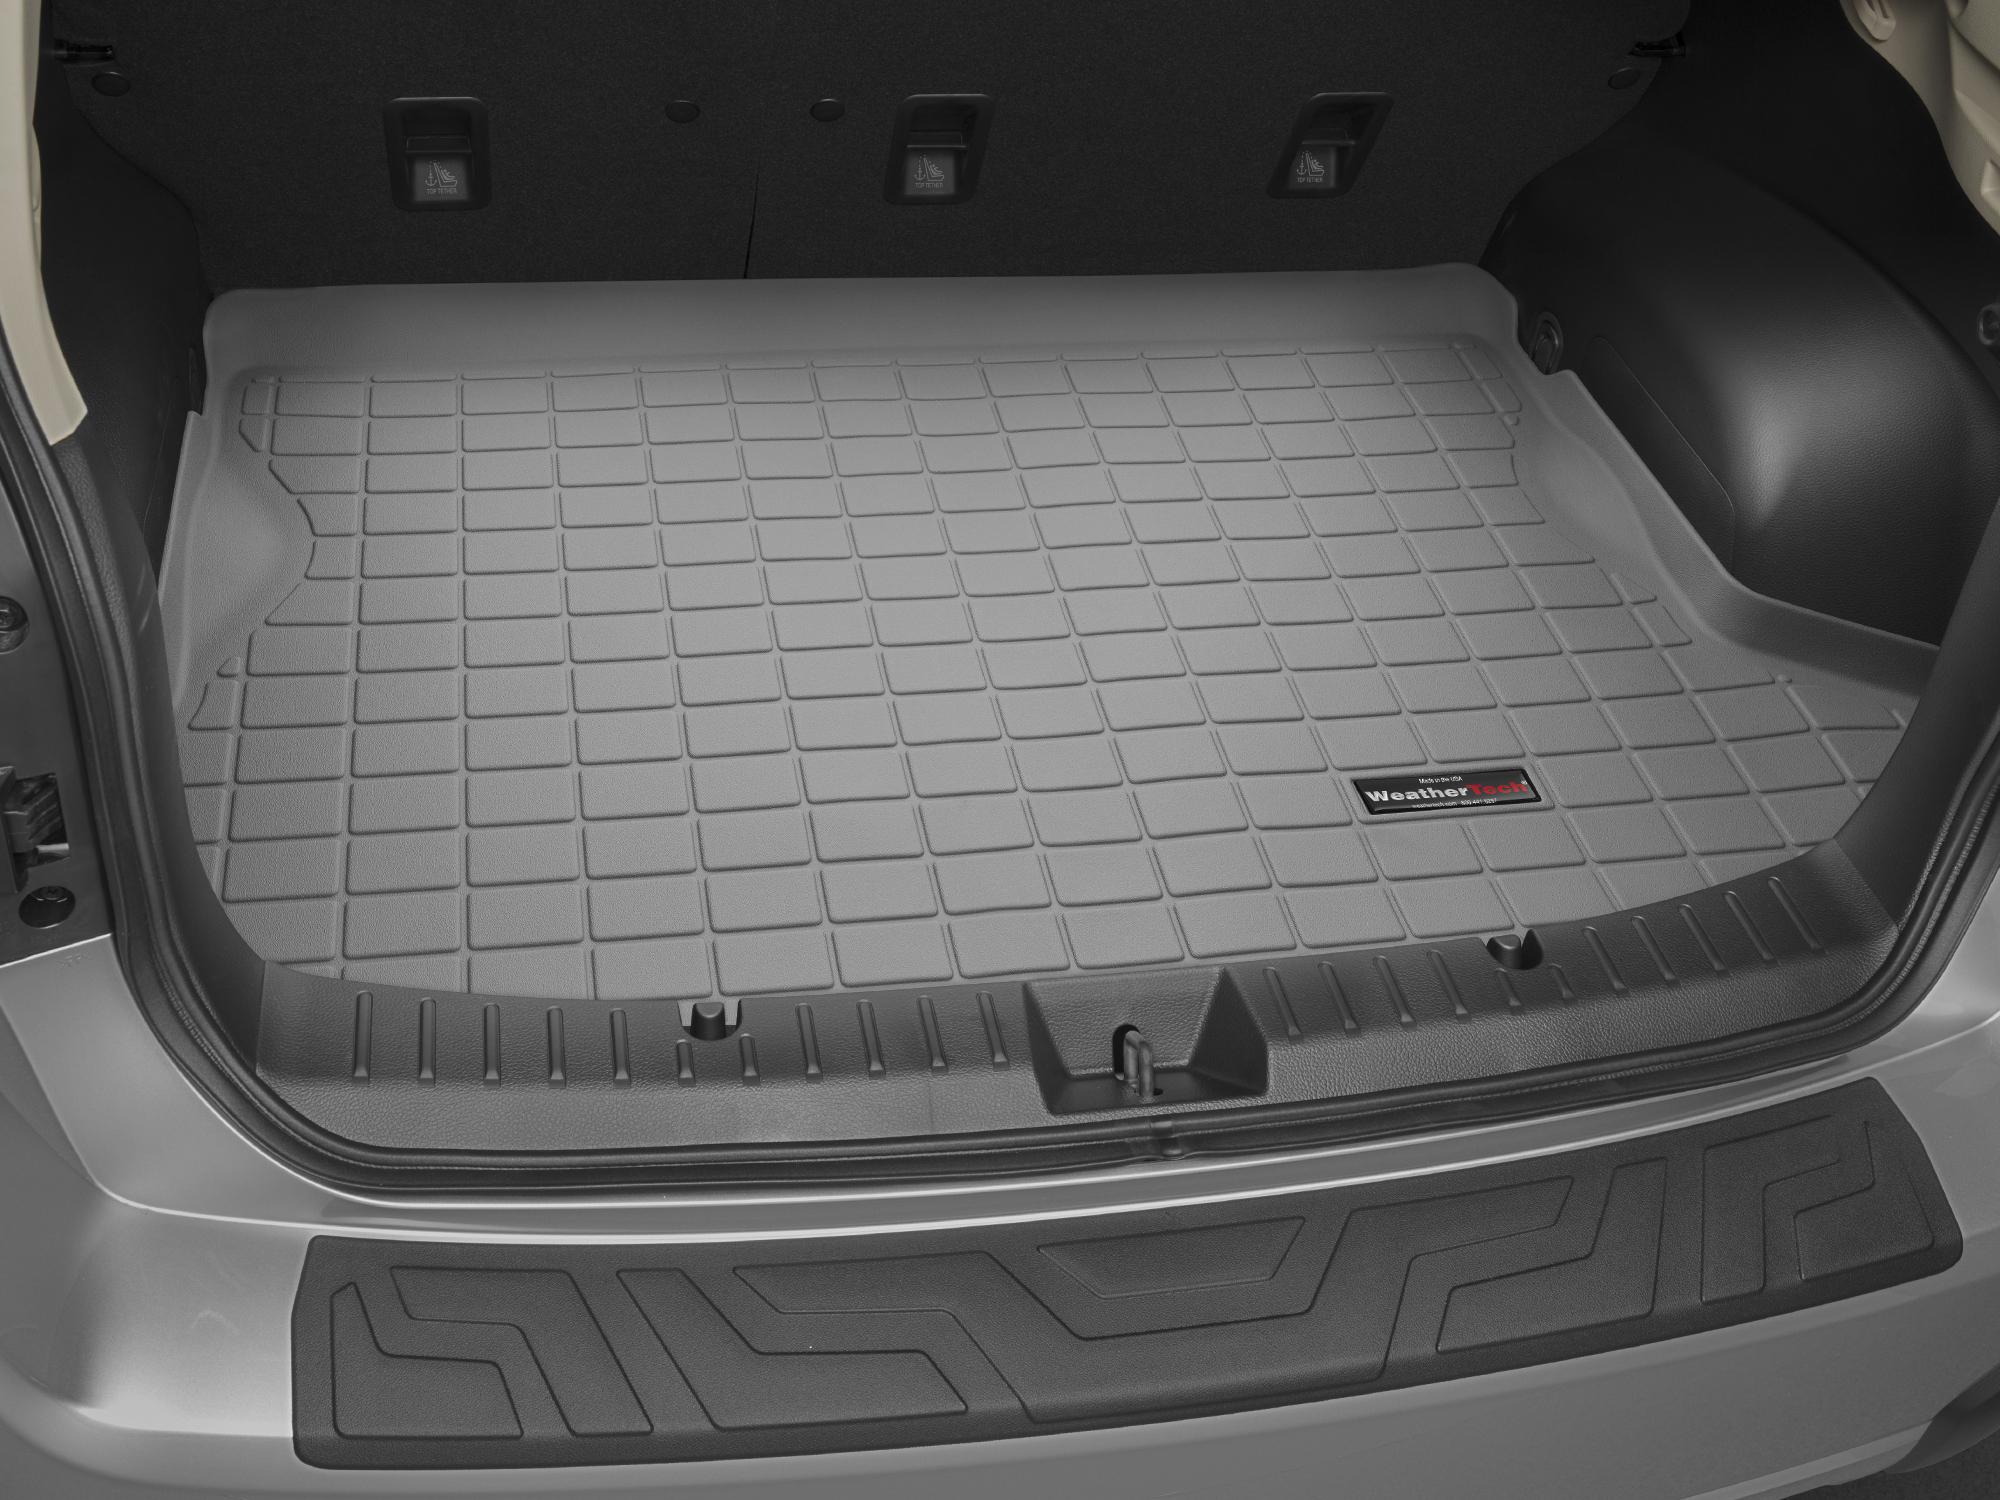 Subaru Impreza 2013>2013 Vasca baule WeatherTech bagagliaio grigio *1154*